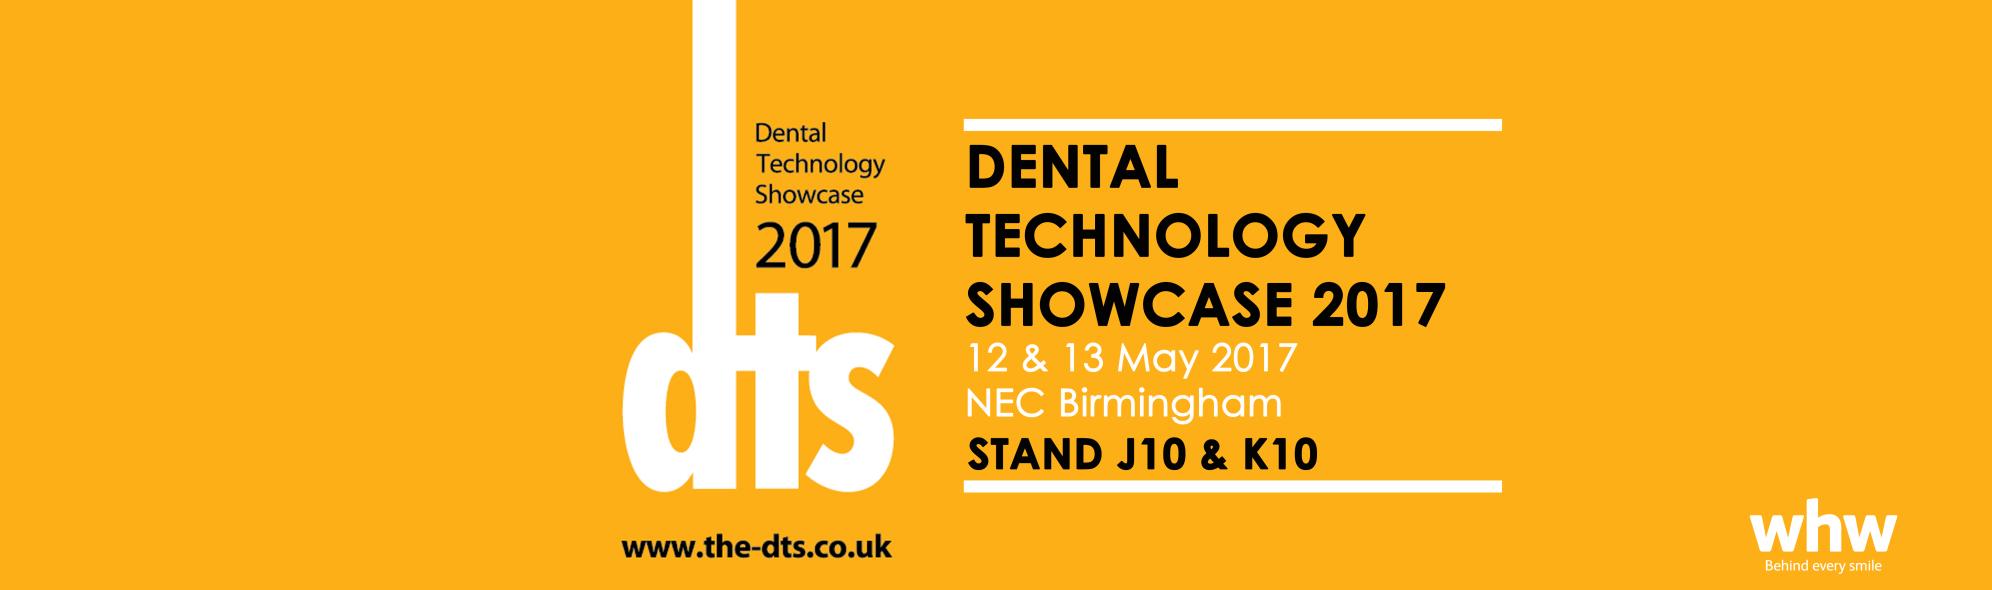 Dental Technology Showcase 2017